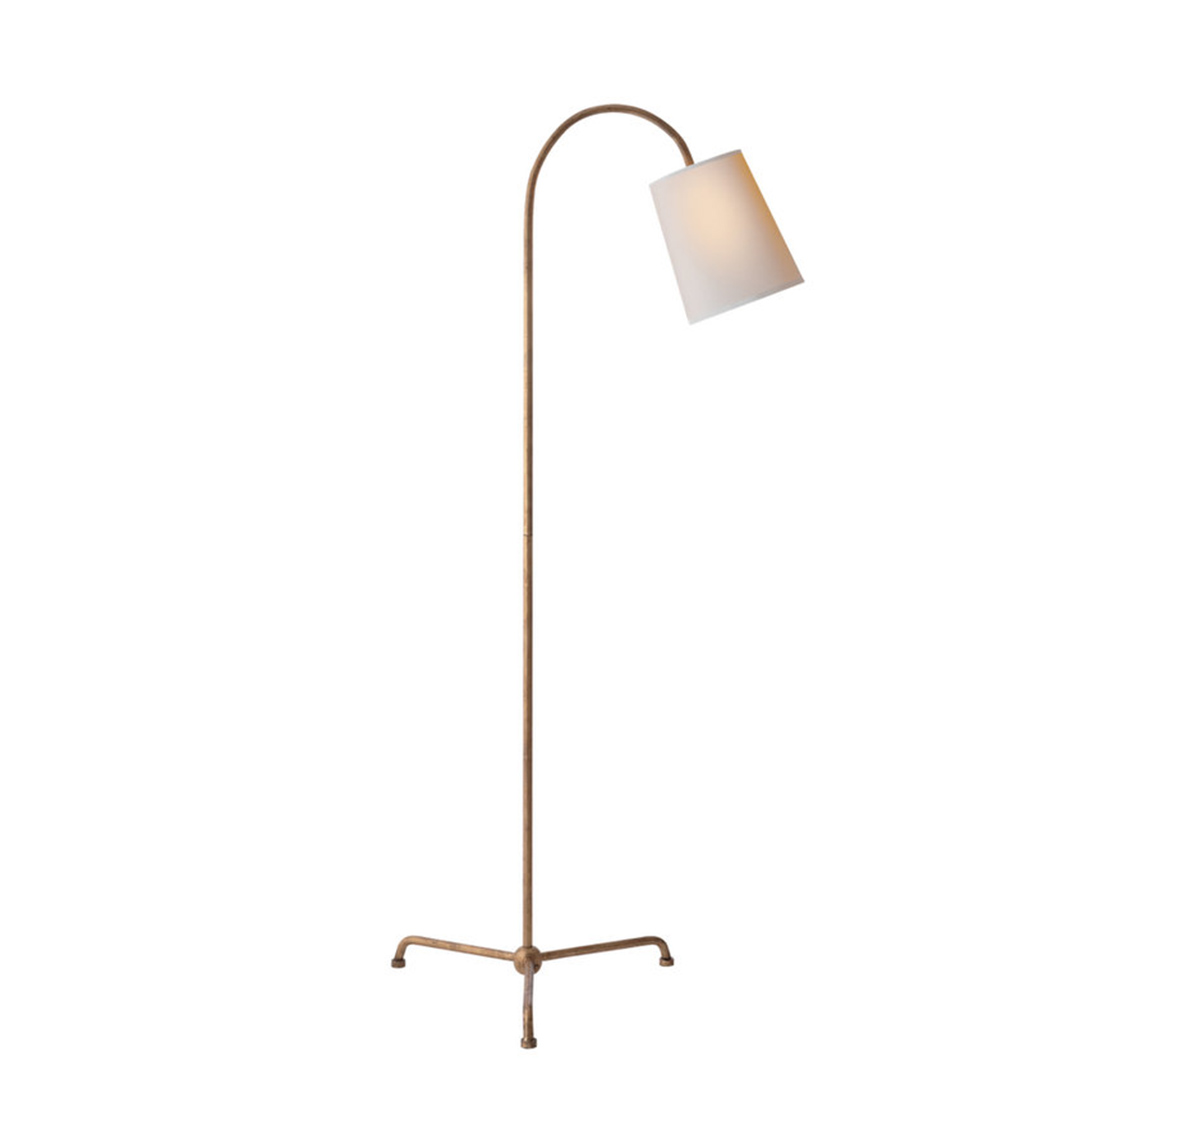 "VCTOB1021GI-NP MIA FLOOR LAMP 56""H"